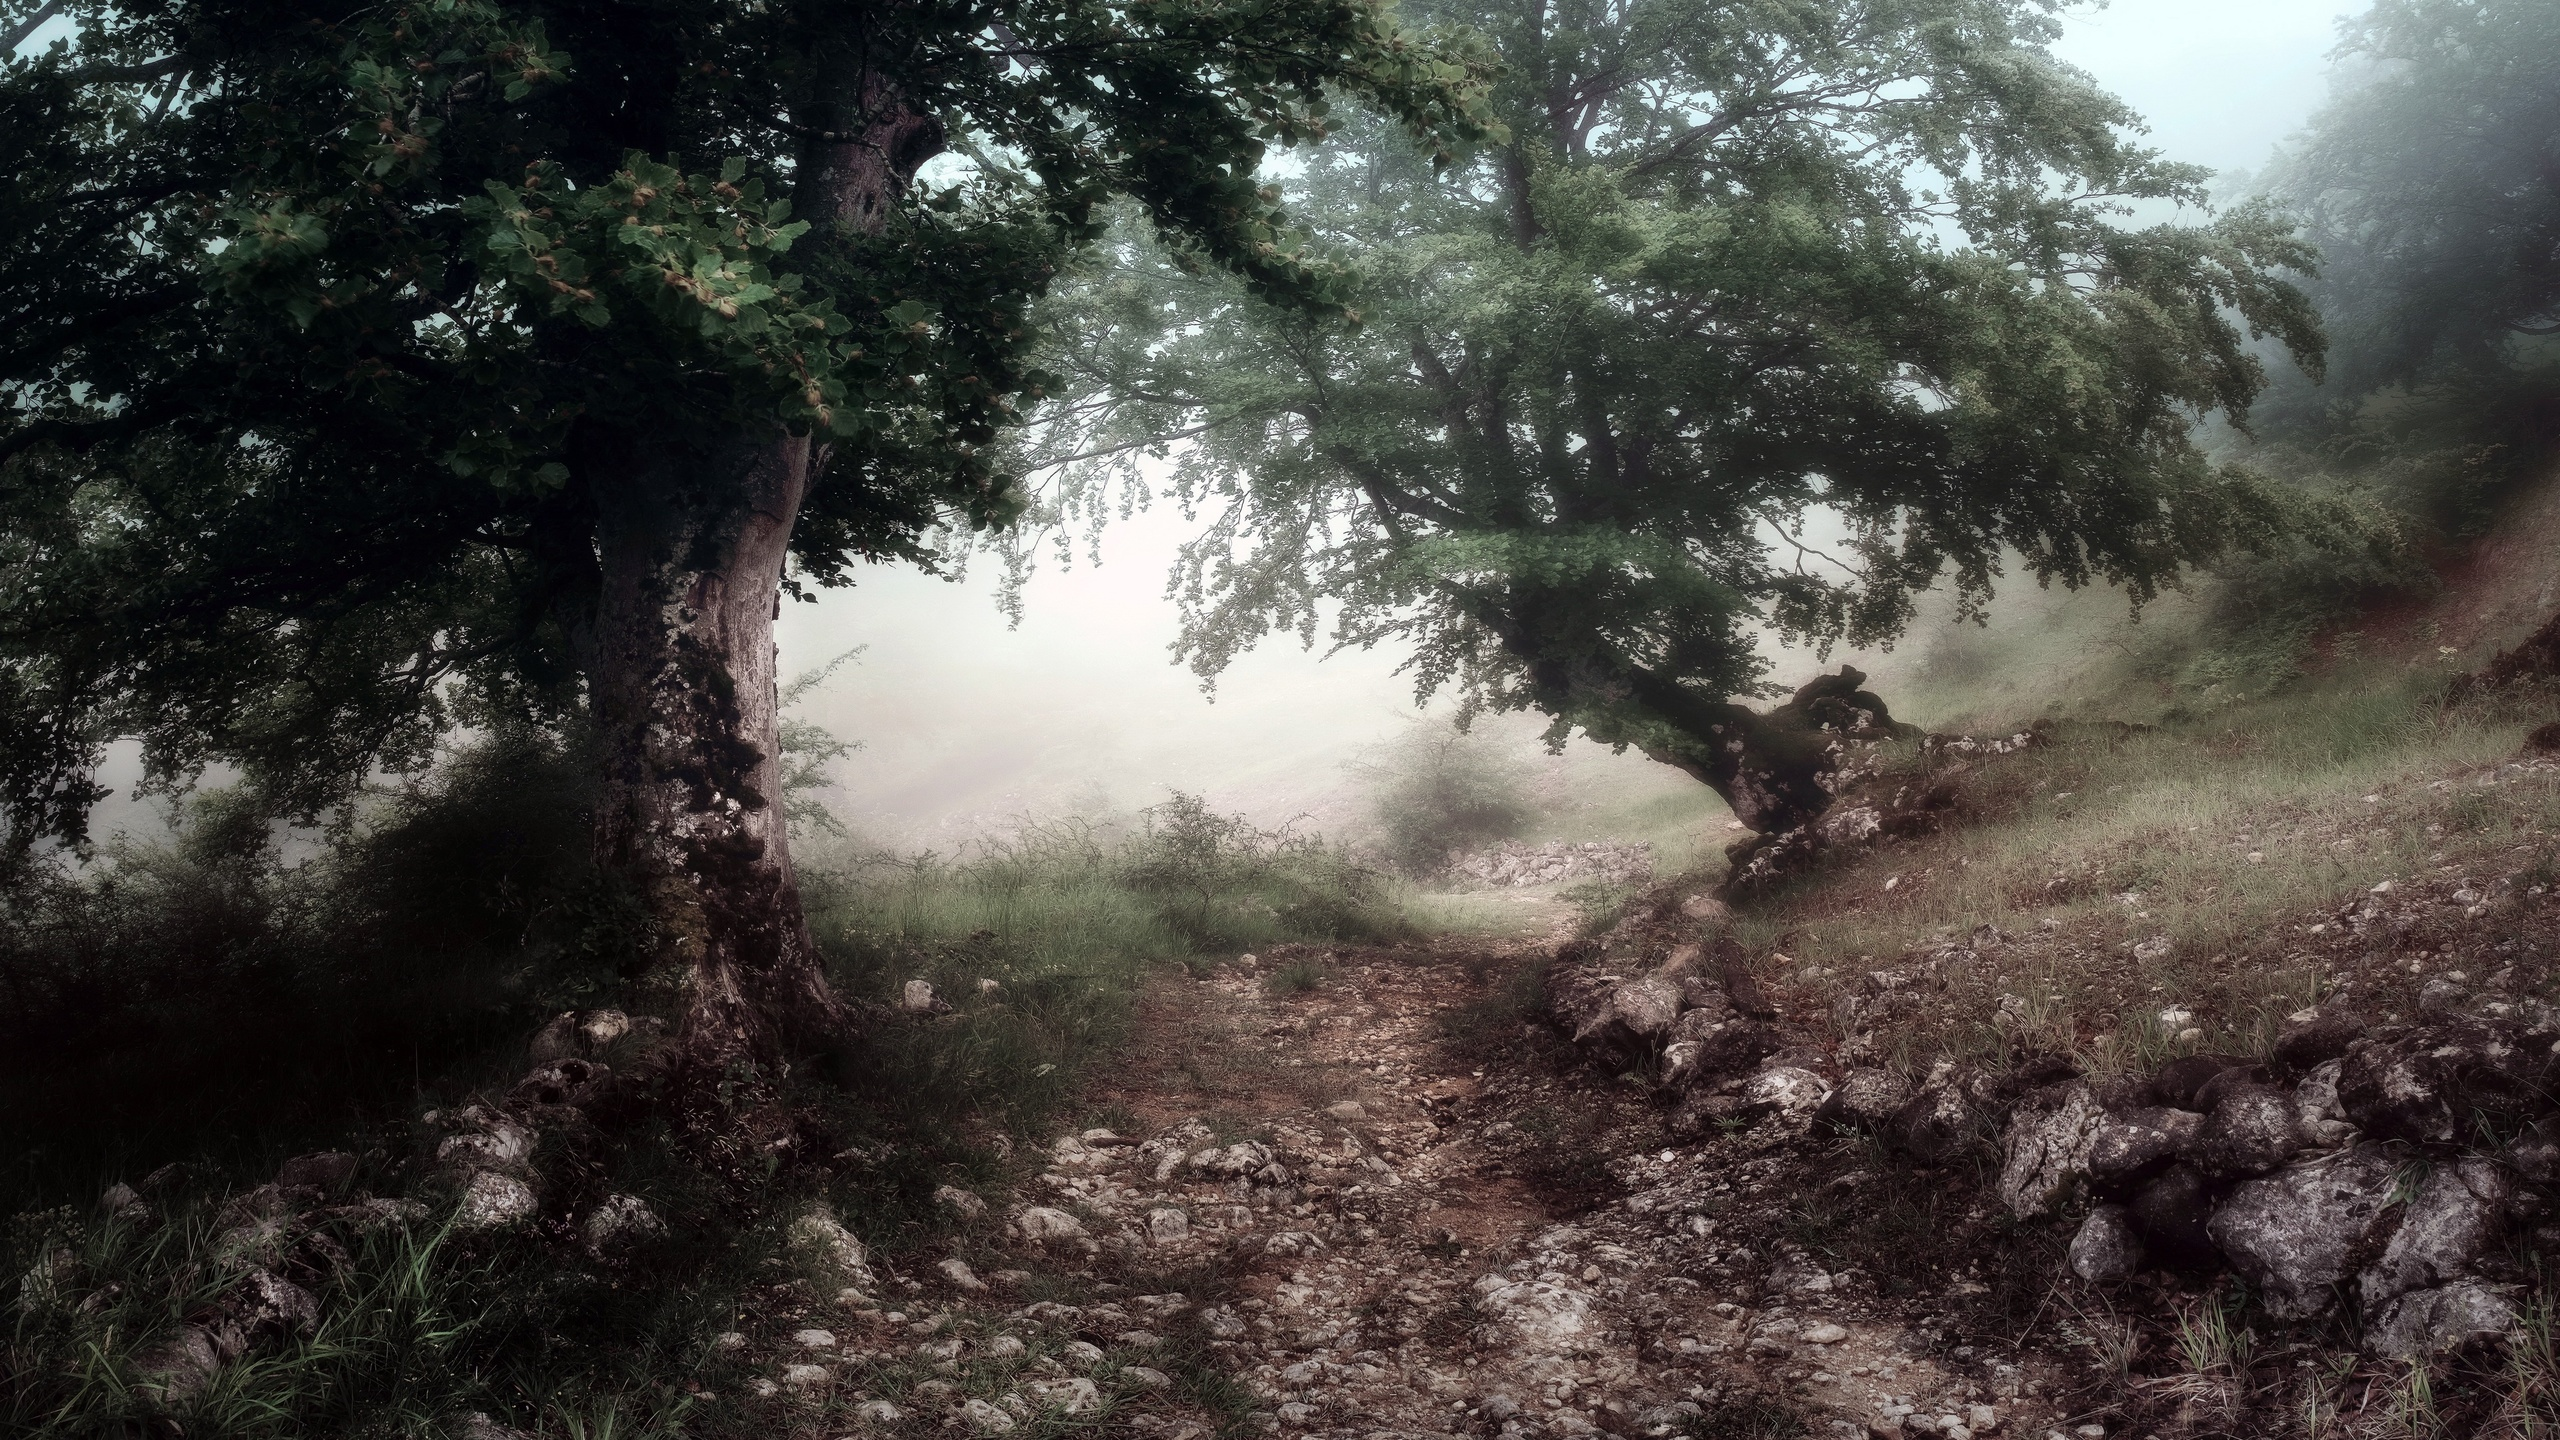 тропинка, деревья